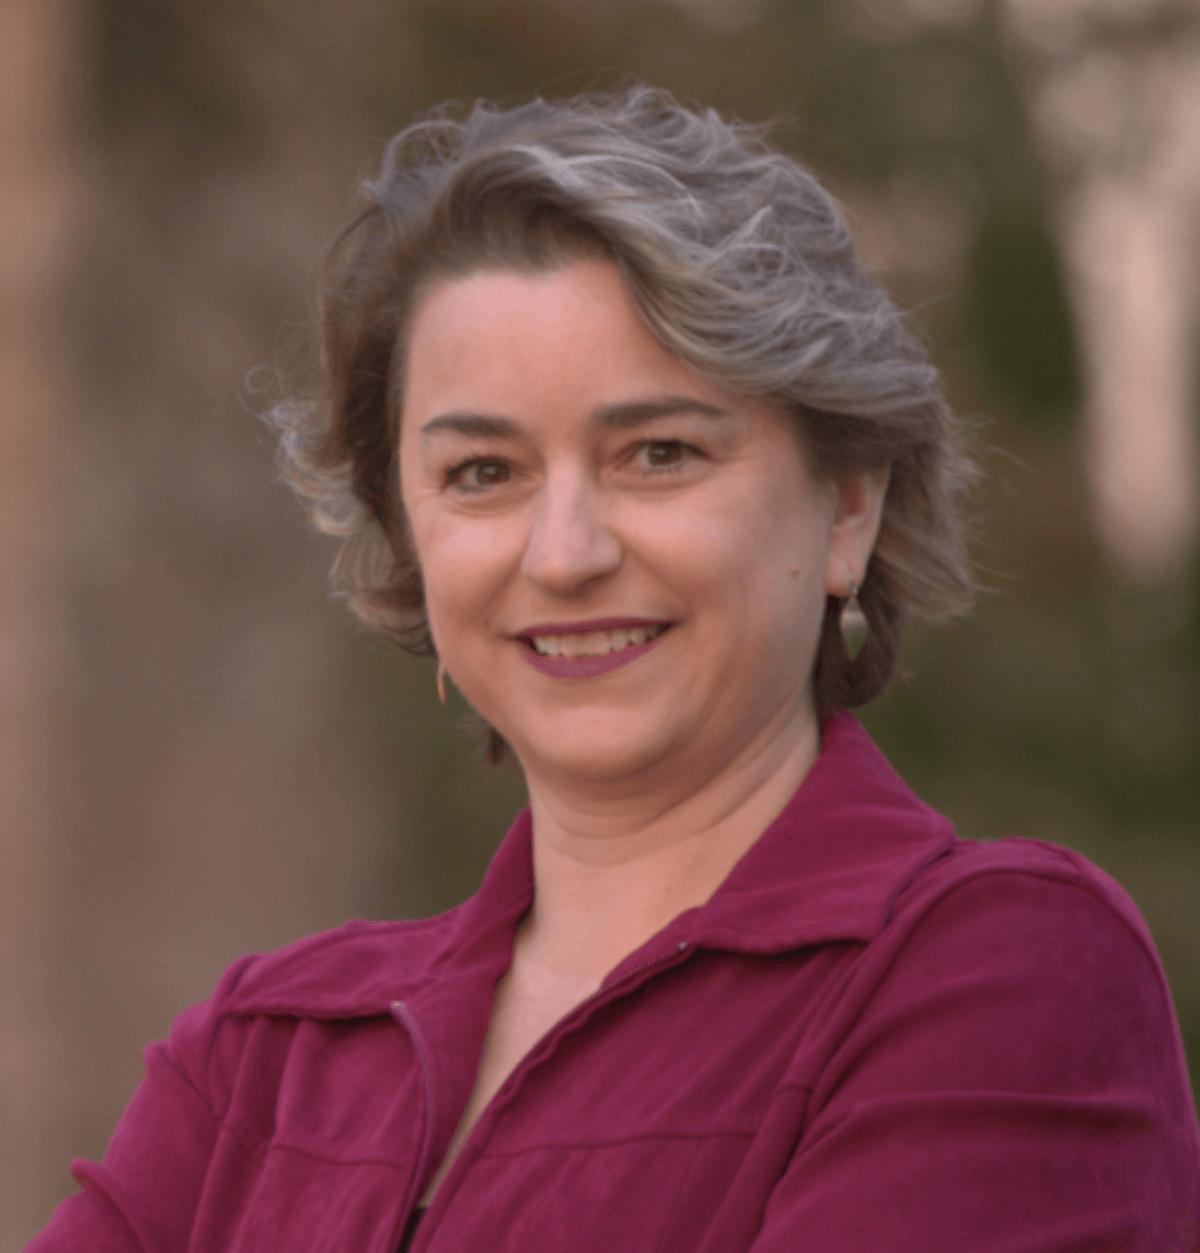 Sheila Briggs Announces Run For State Superintendent